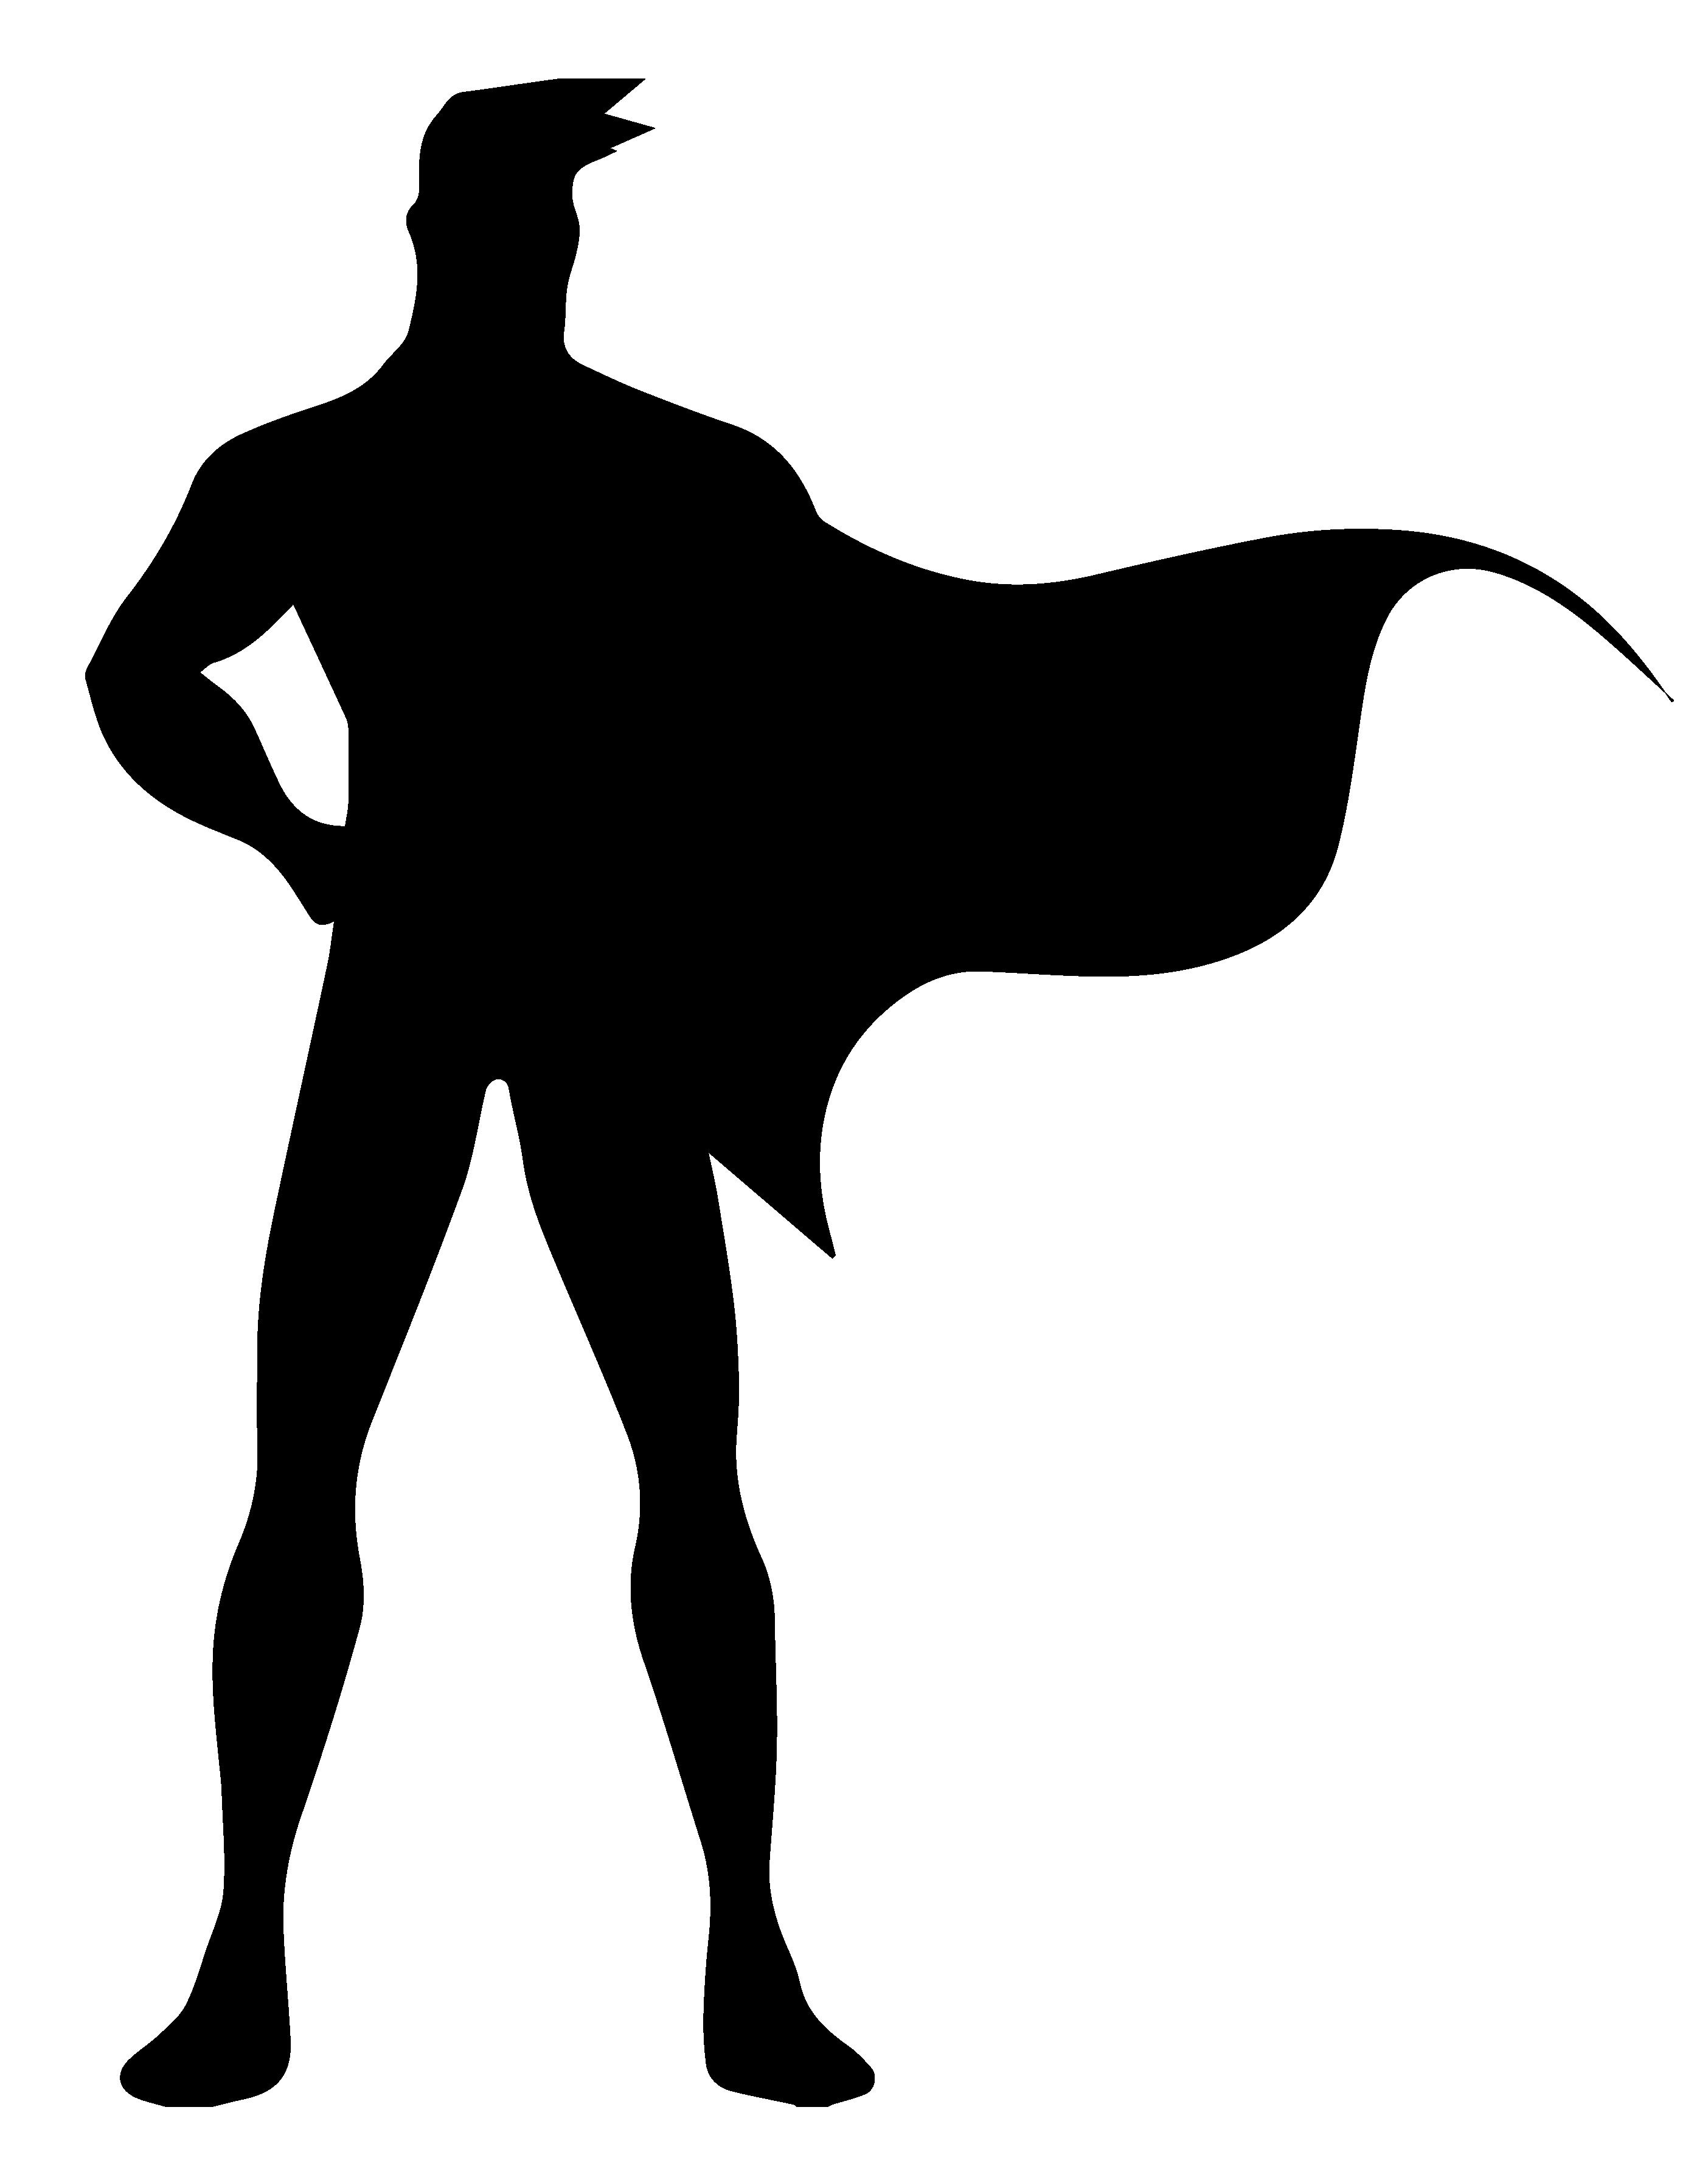 sticker-design-superhero-2-01